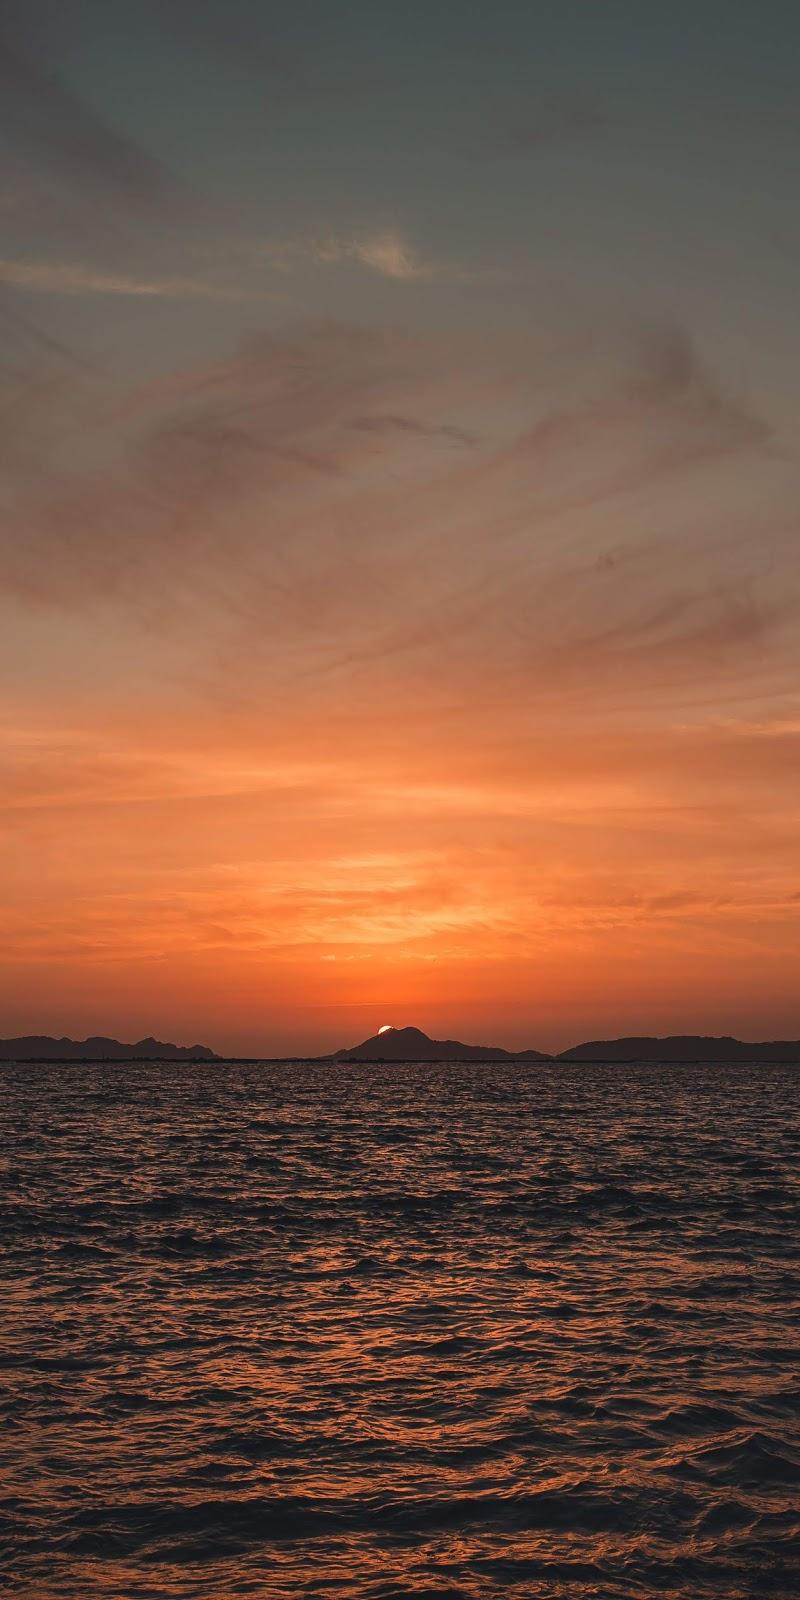 Sky during sunset wallpaper